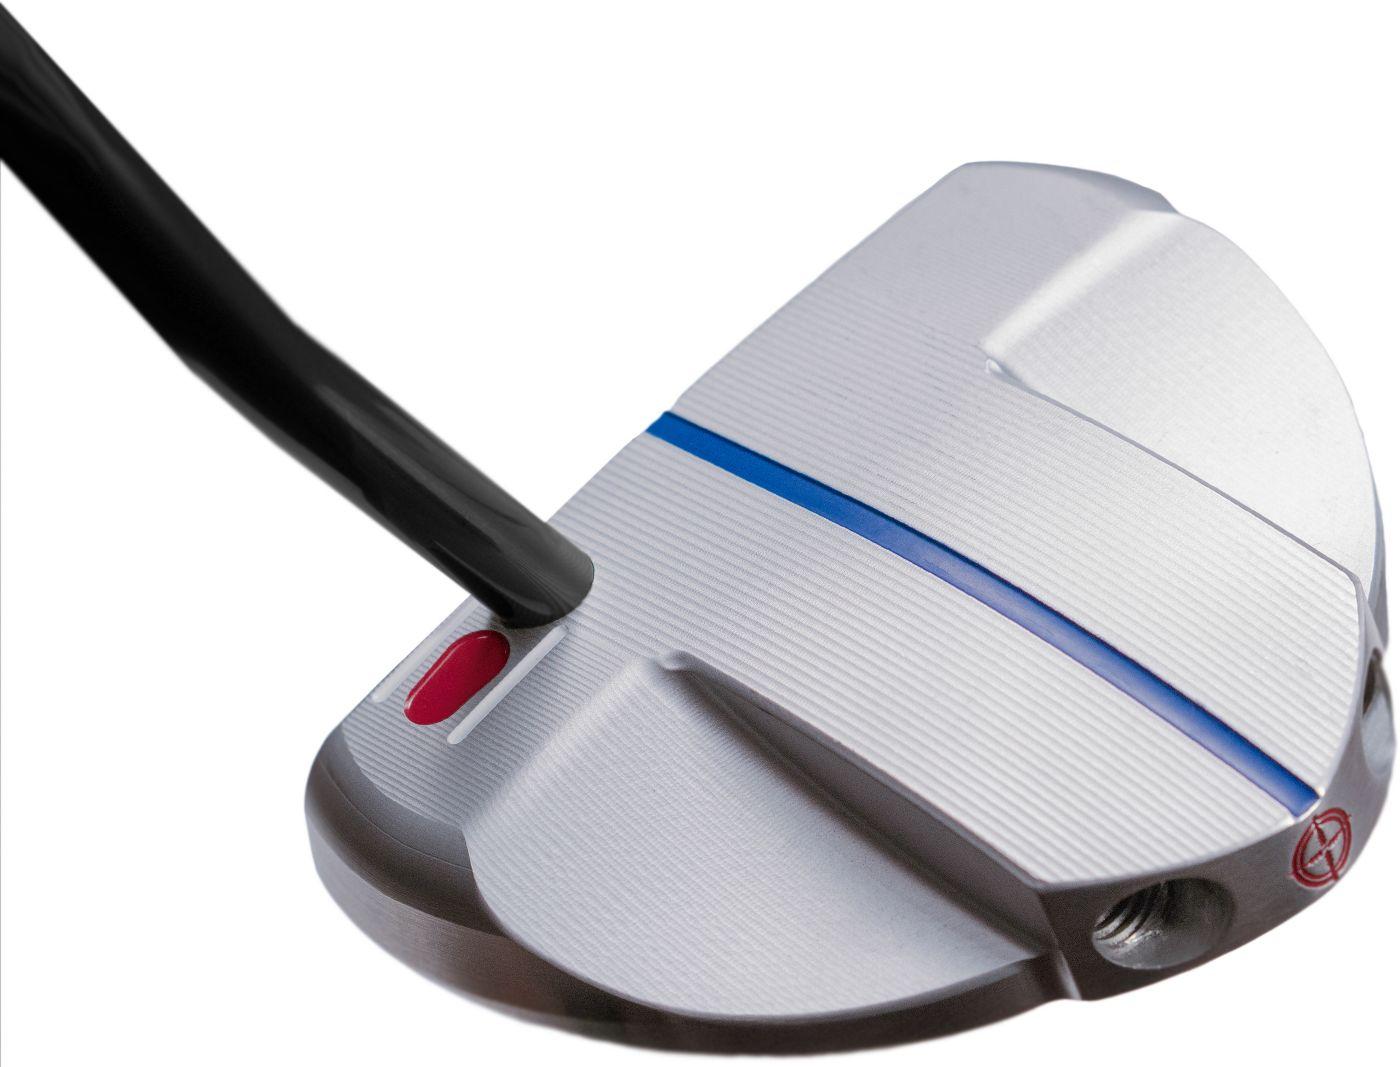 SeeMore SB20 Mallet Offset Platinum Putter